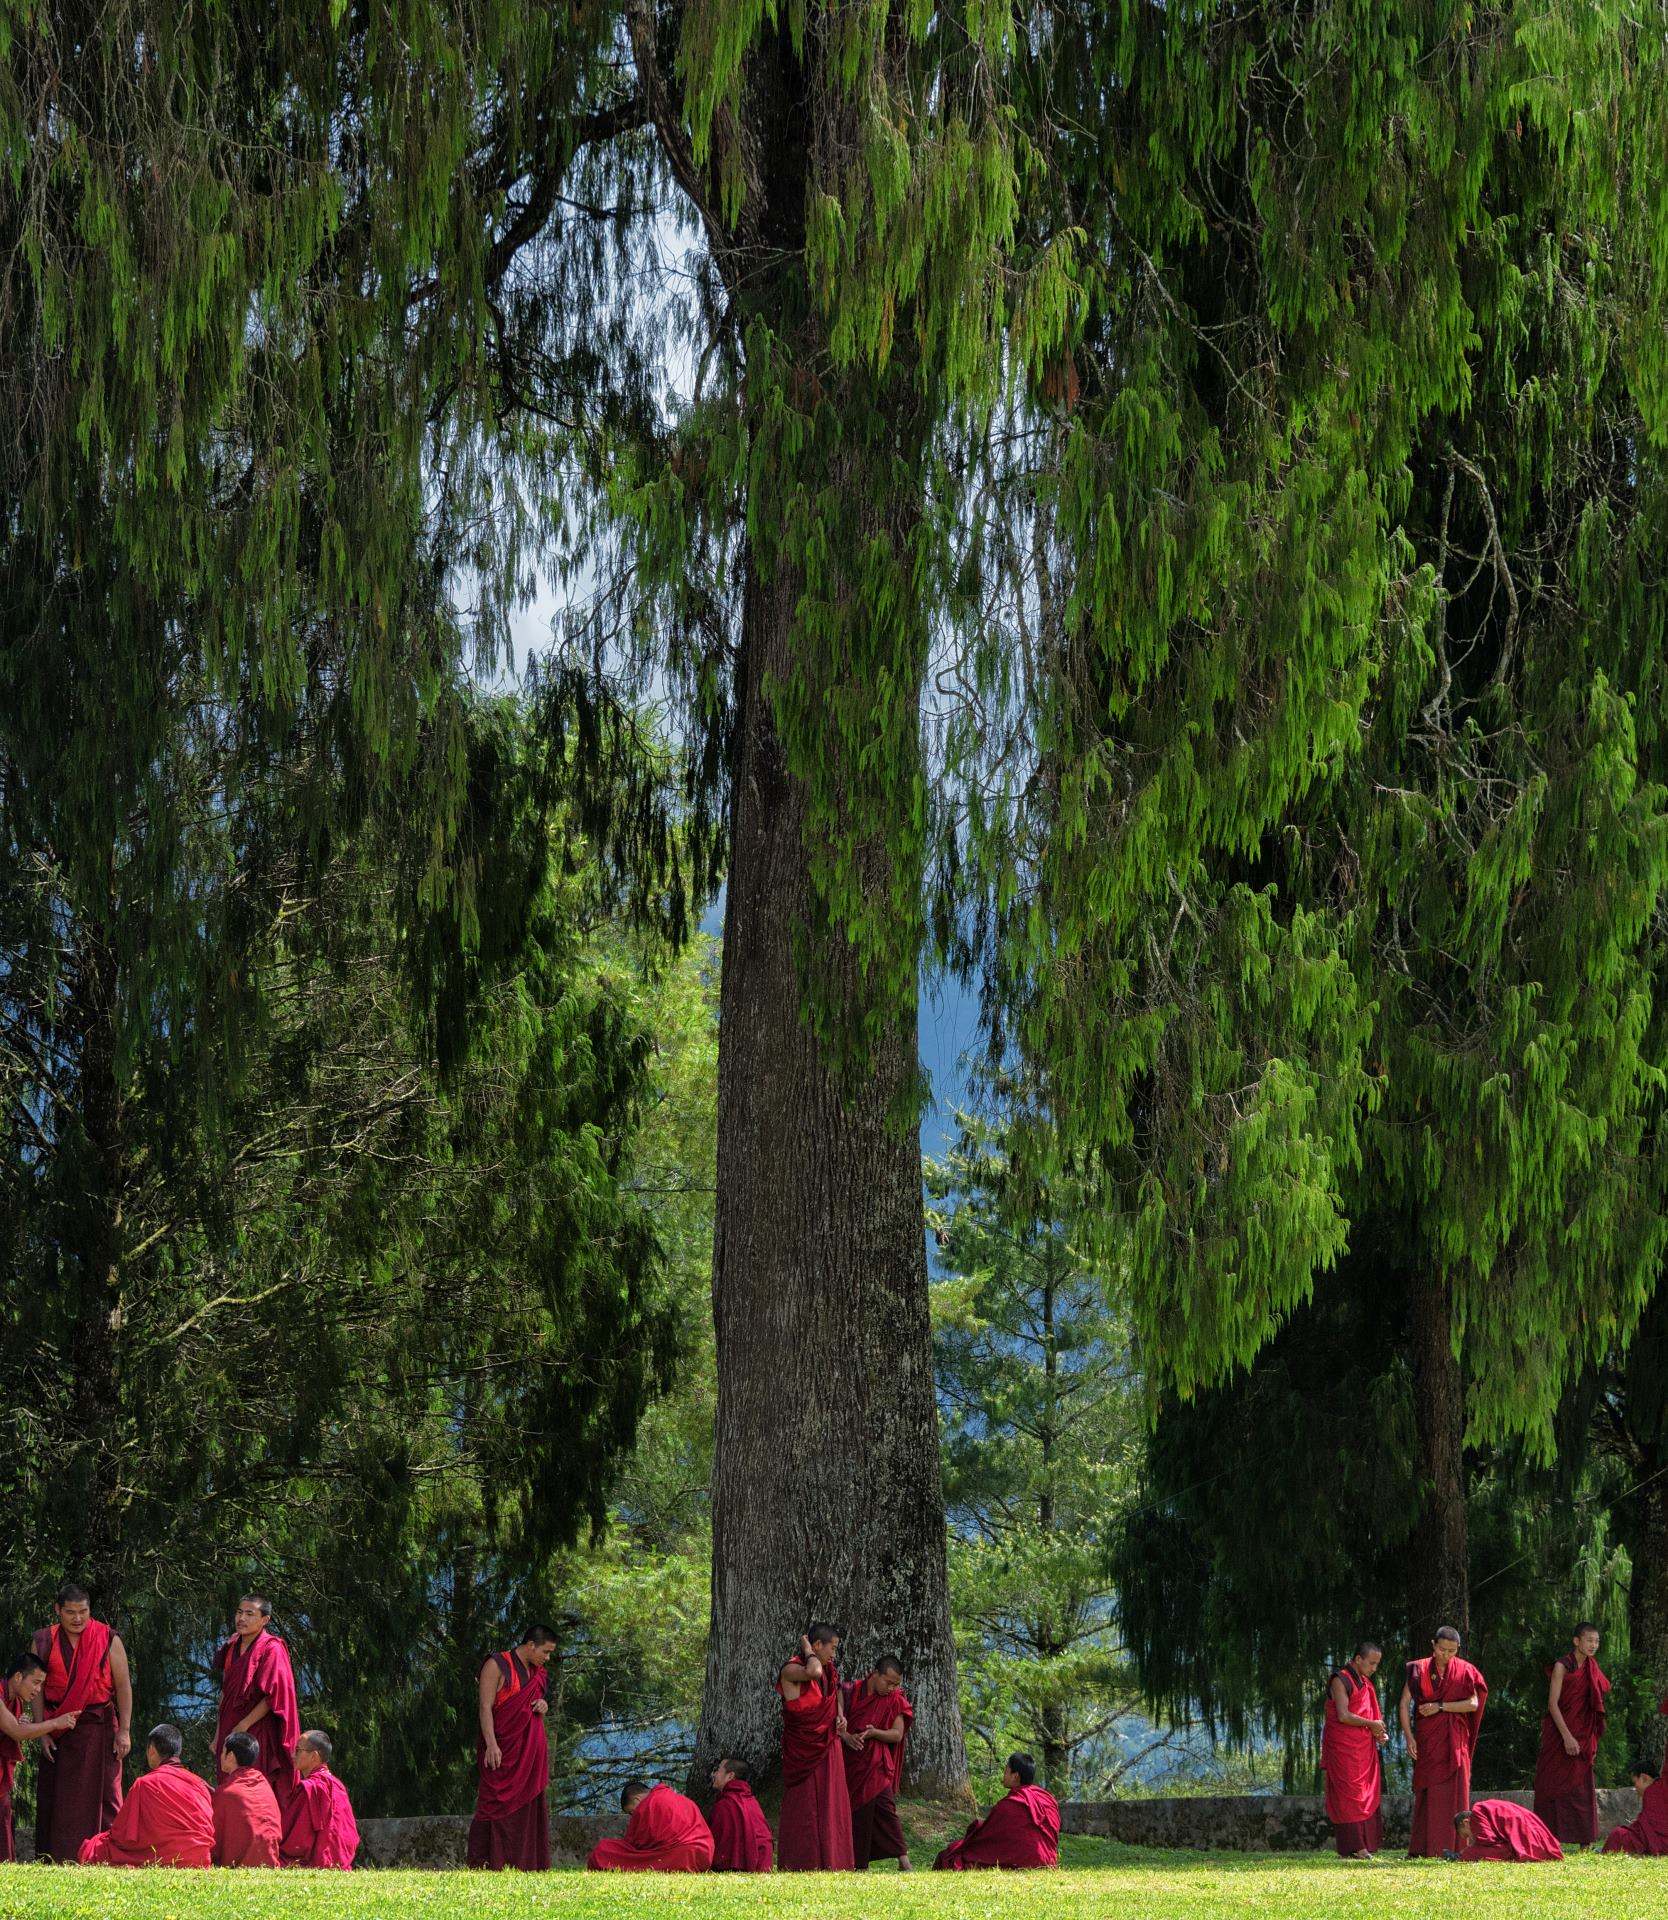 Monks debating on Buddhist Philosophy at Talo Monastery